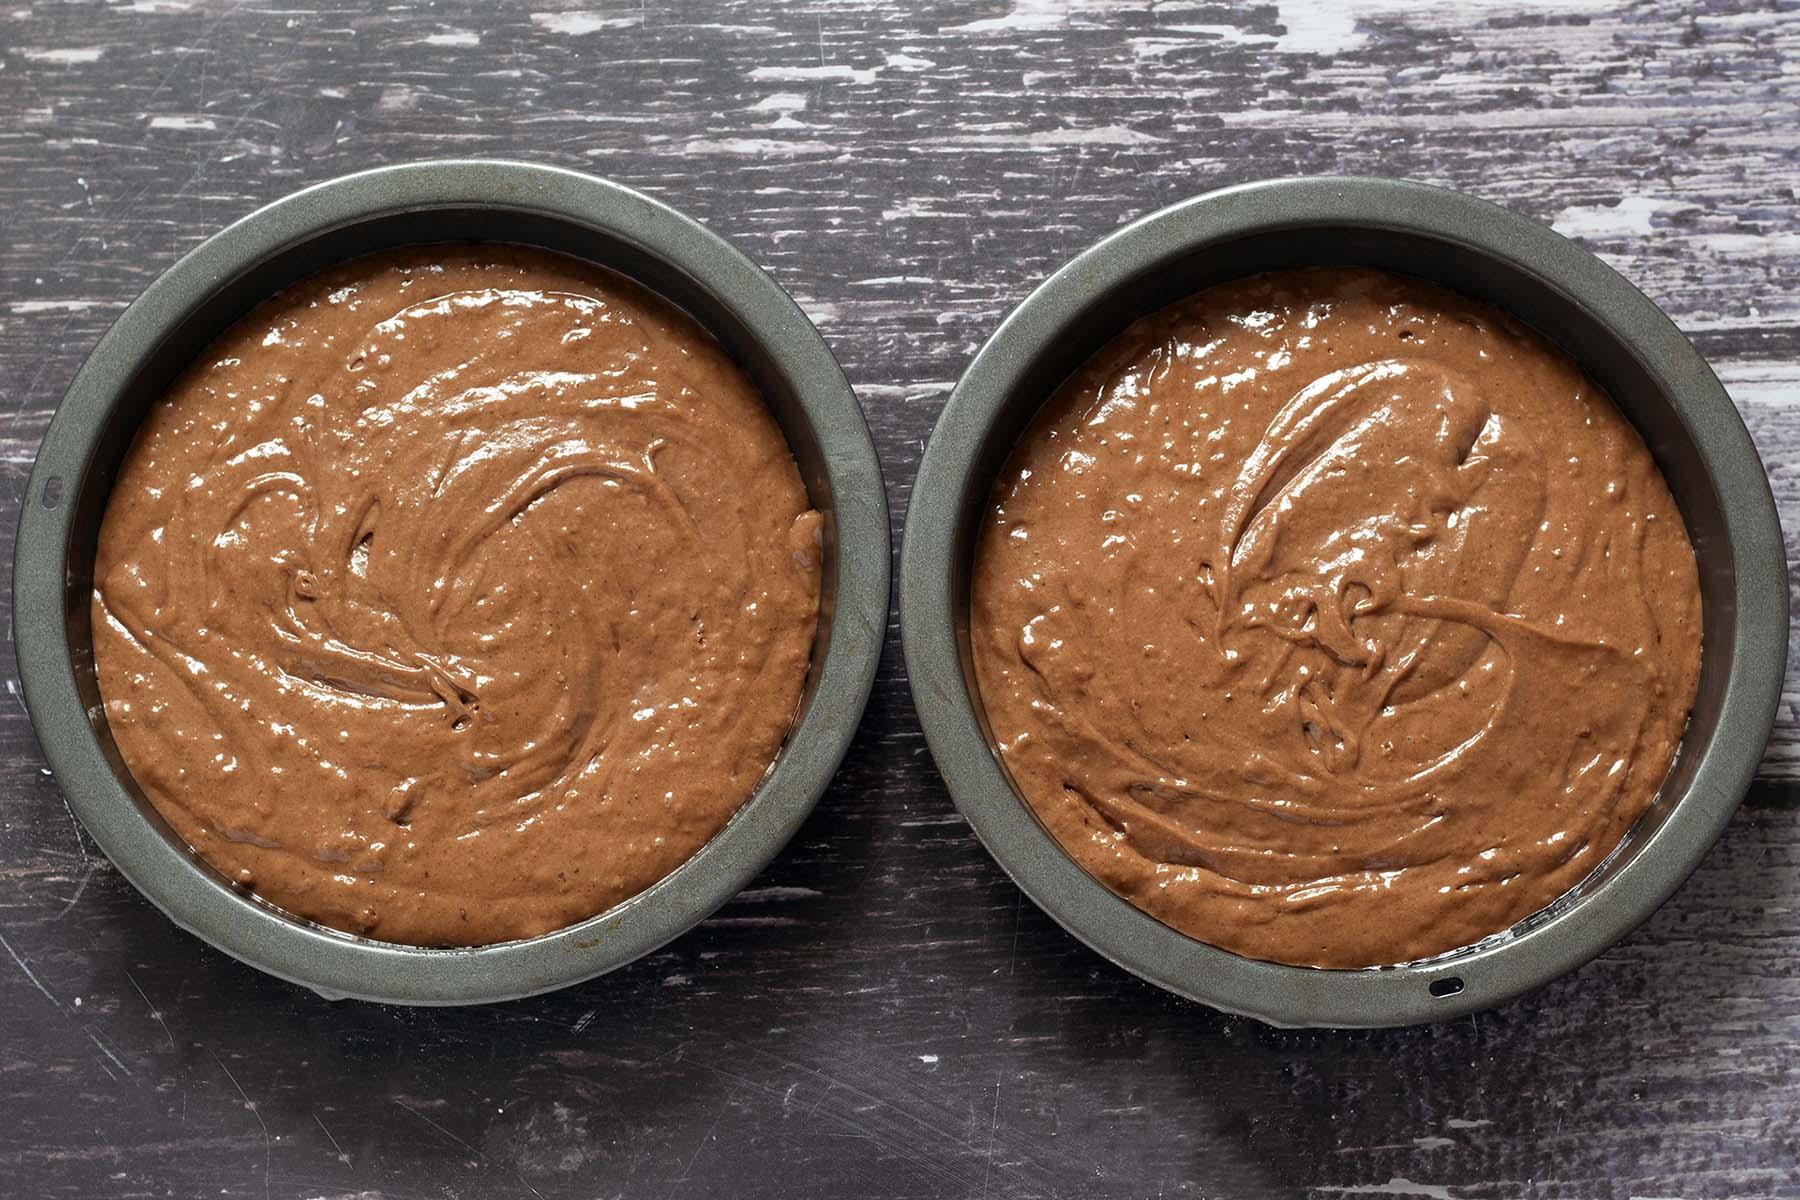 unbaked vegan chocolate cakes in tin